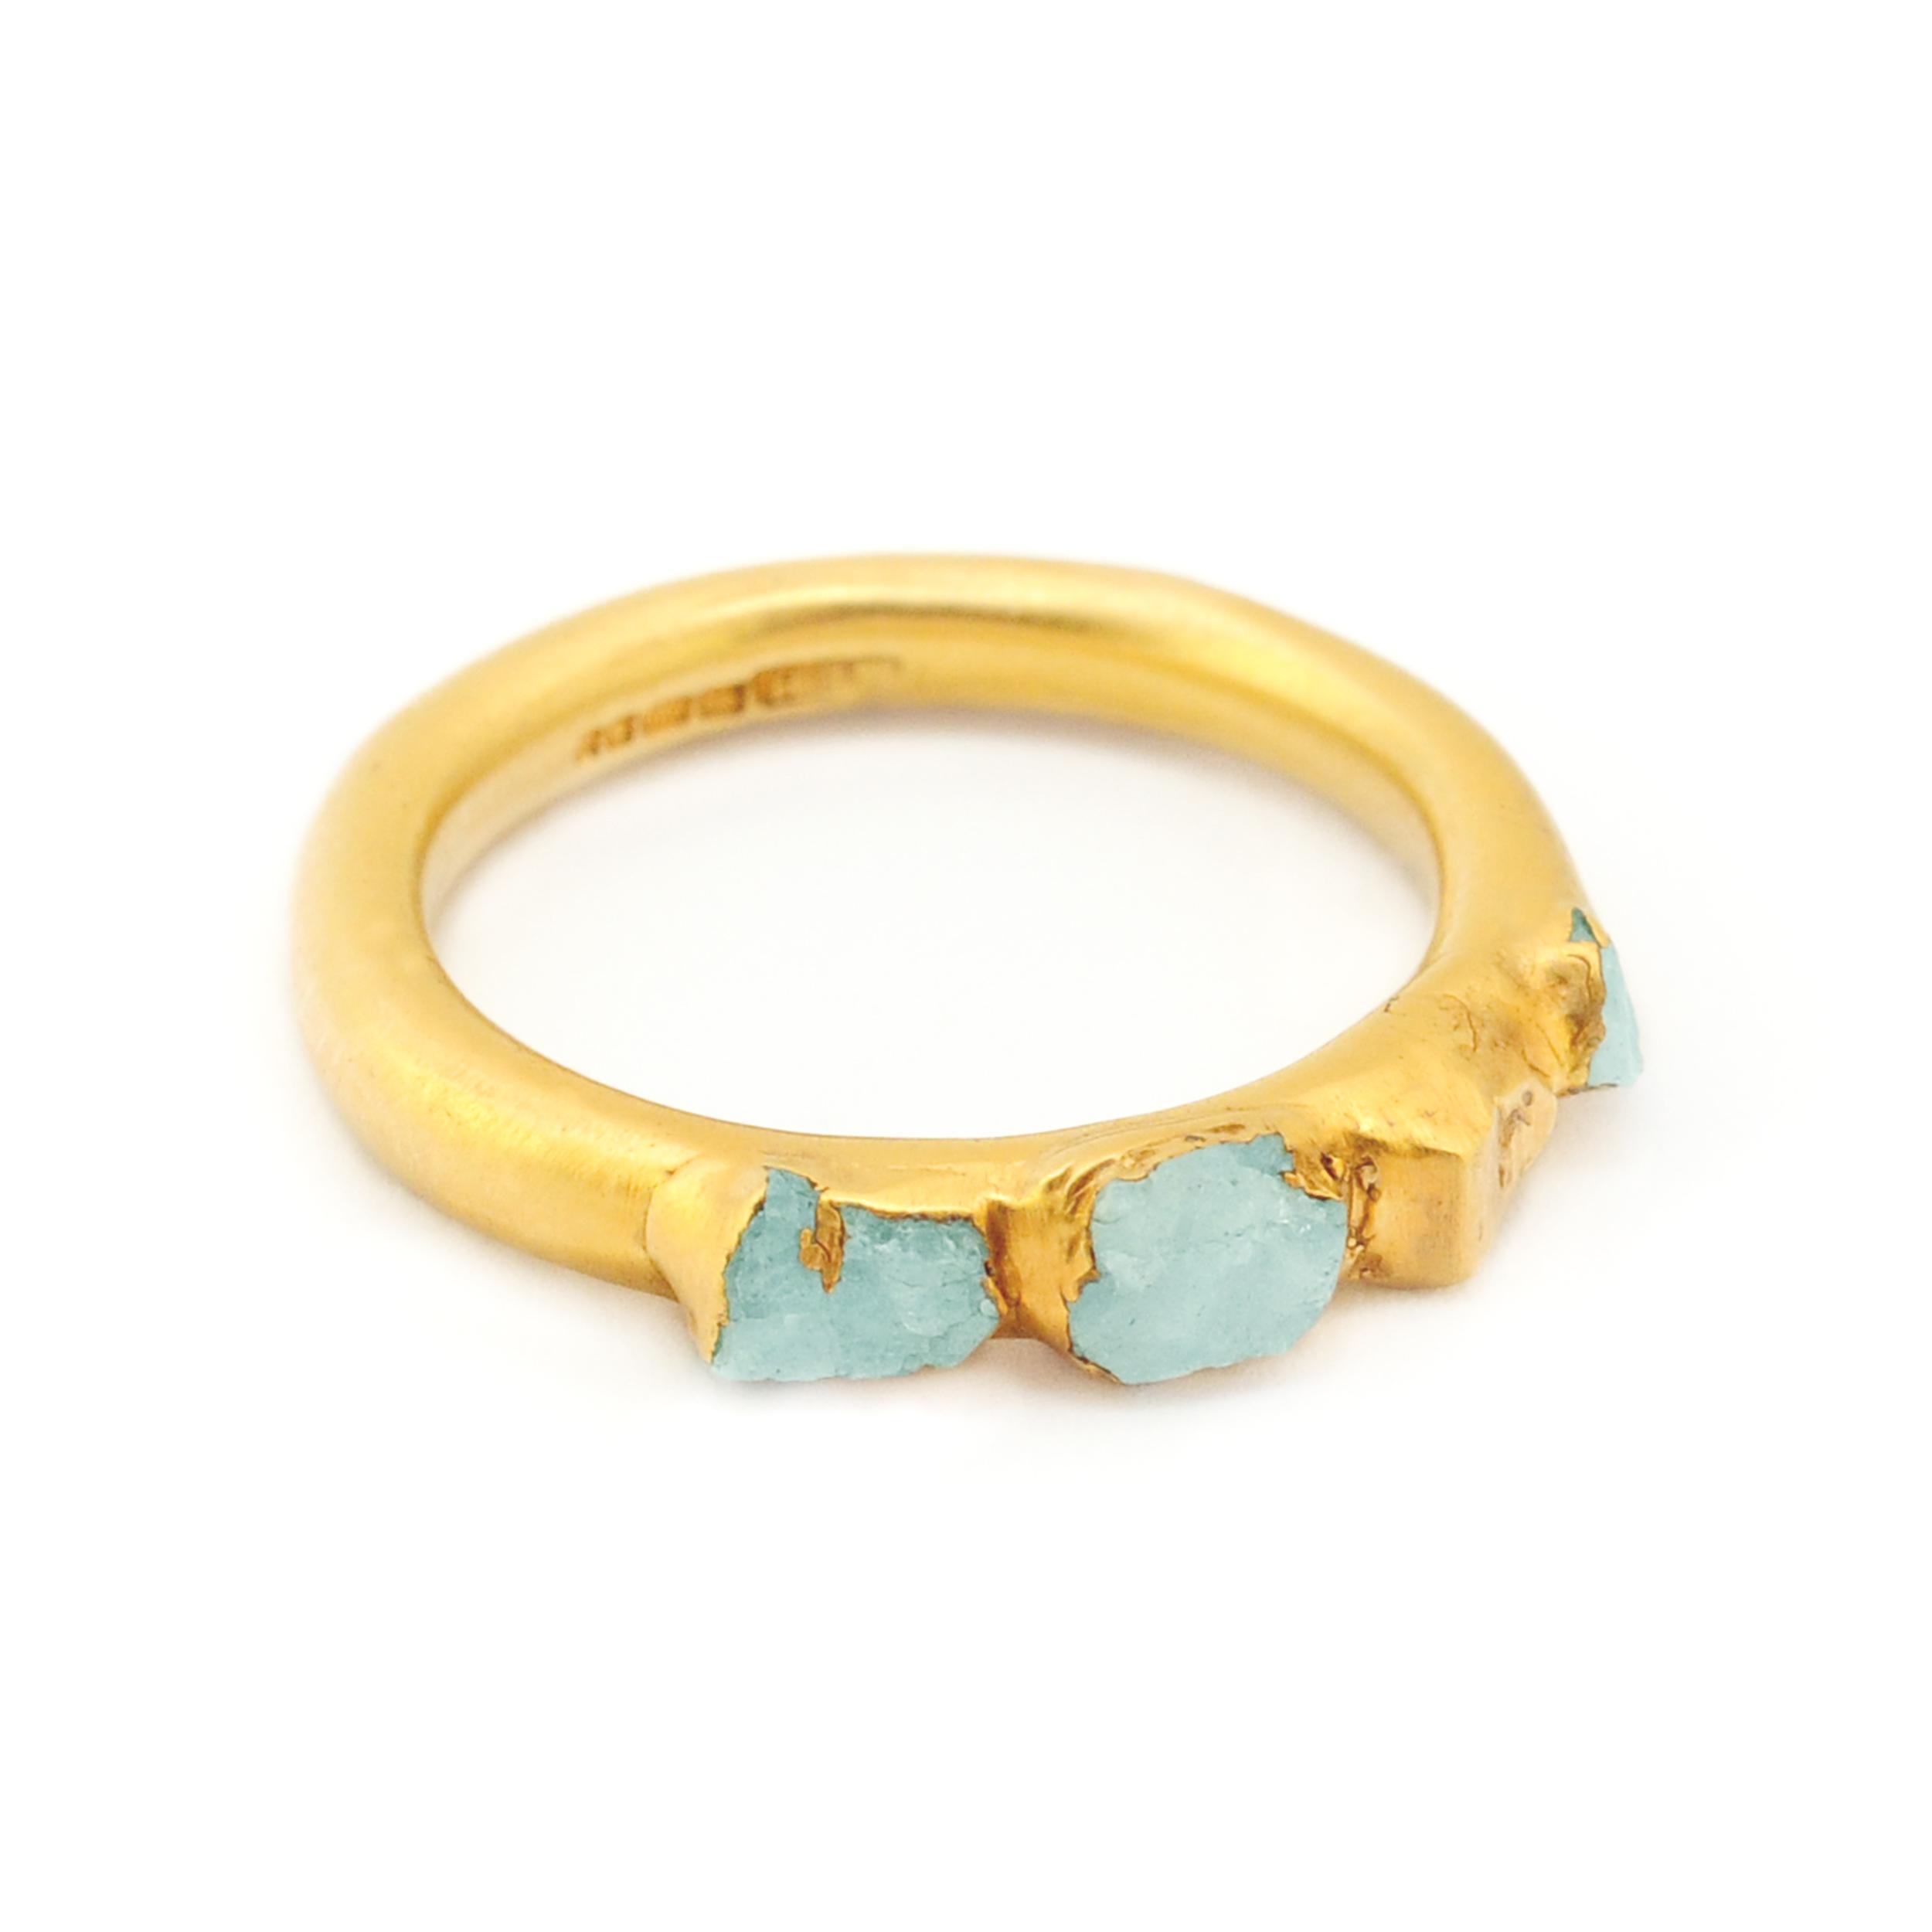 4. Mabel Hasell - Gold plated aquamarine crystal ring.jpg